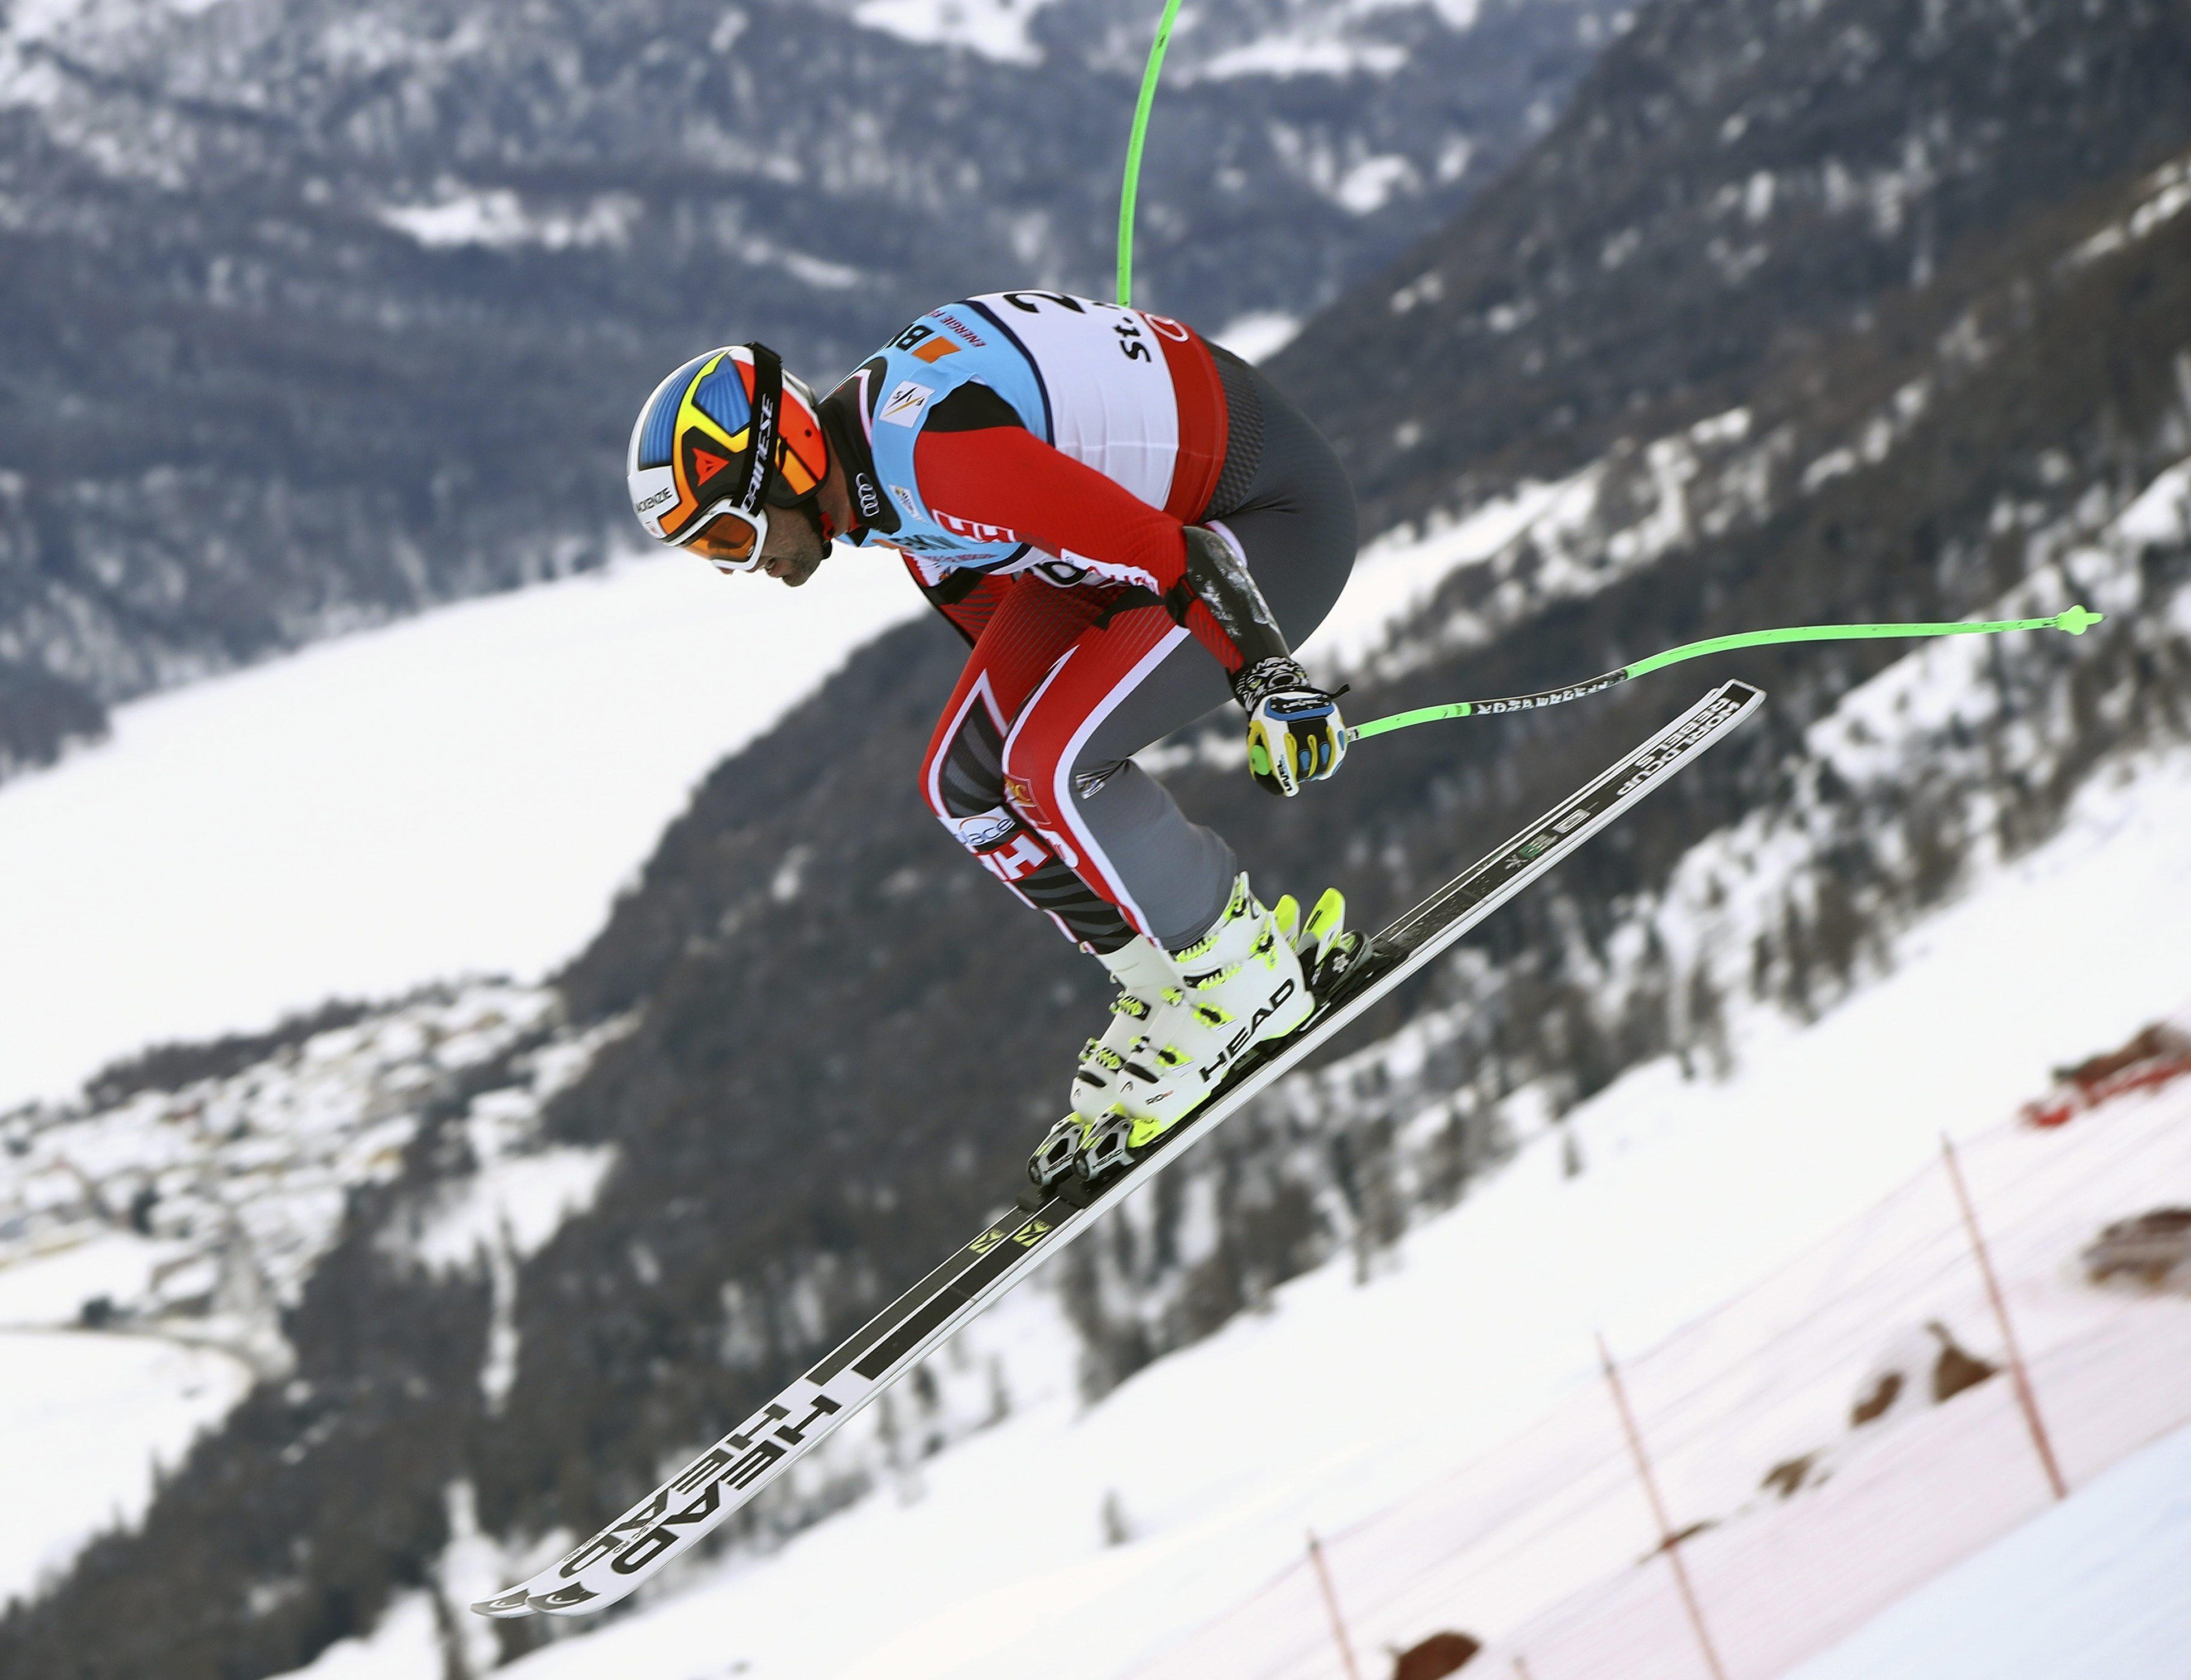 Canada's Manuel Osborne Paradis is airborne during a men's super-G, at the alpine ski World Championships, in St. Moritz, Switzerland, Wednesday, Feb. 8, 2017. (AP Photo/Alessandro Trovati)